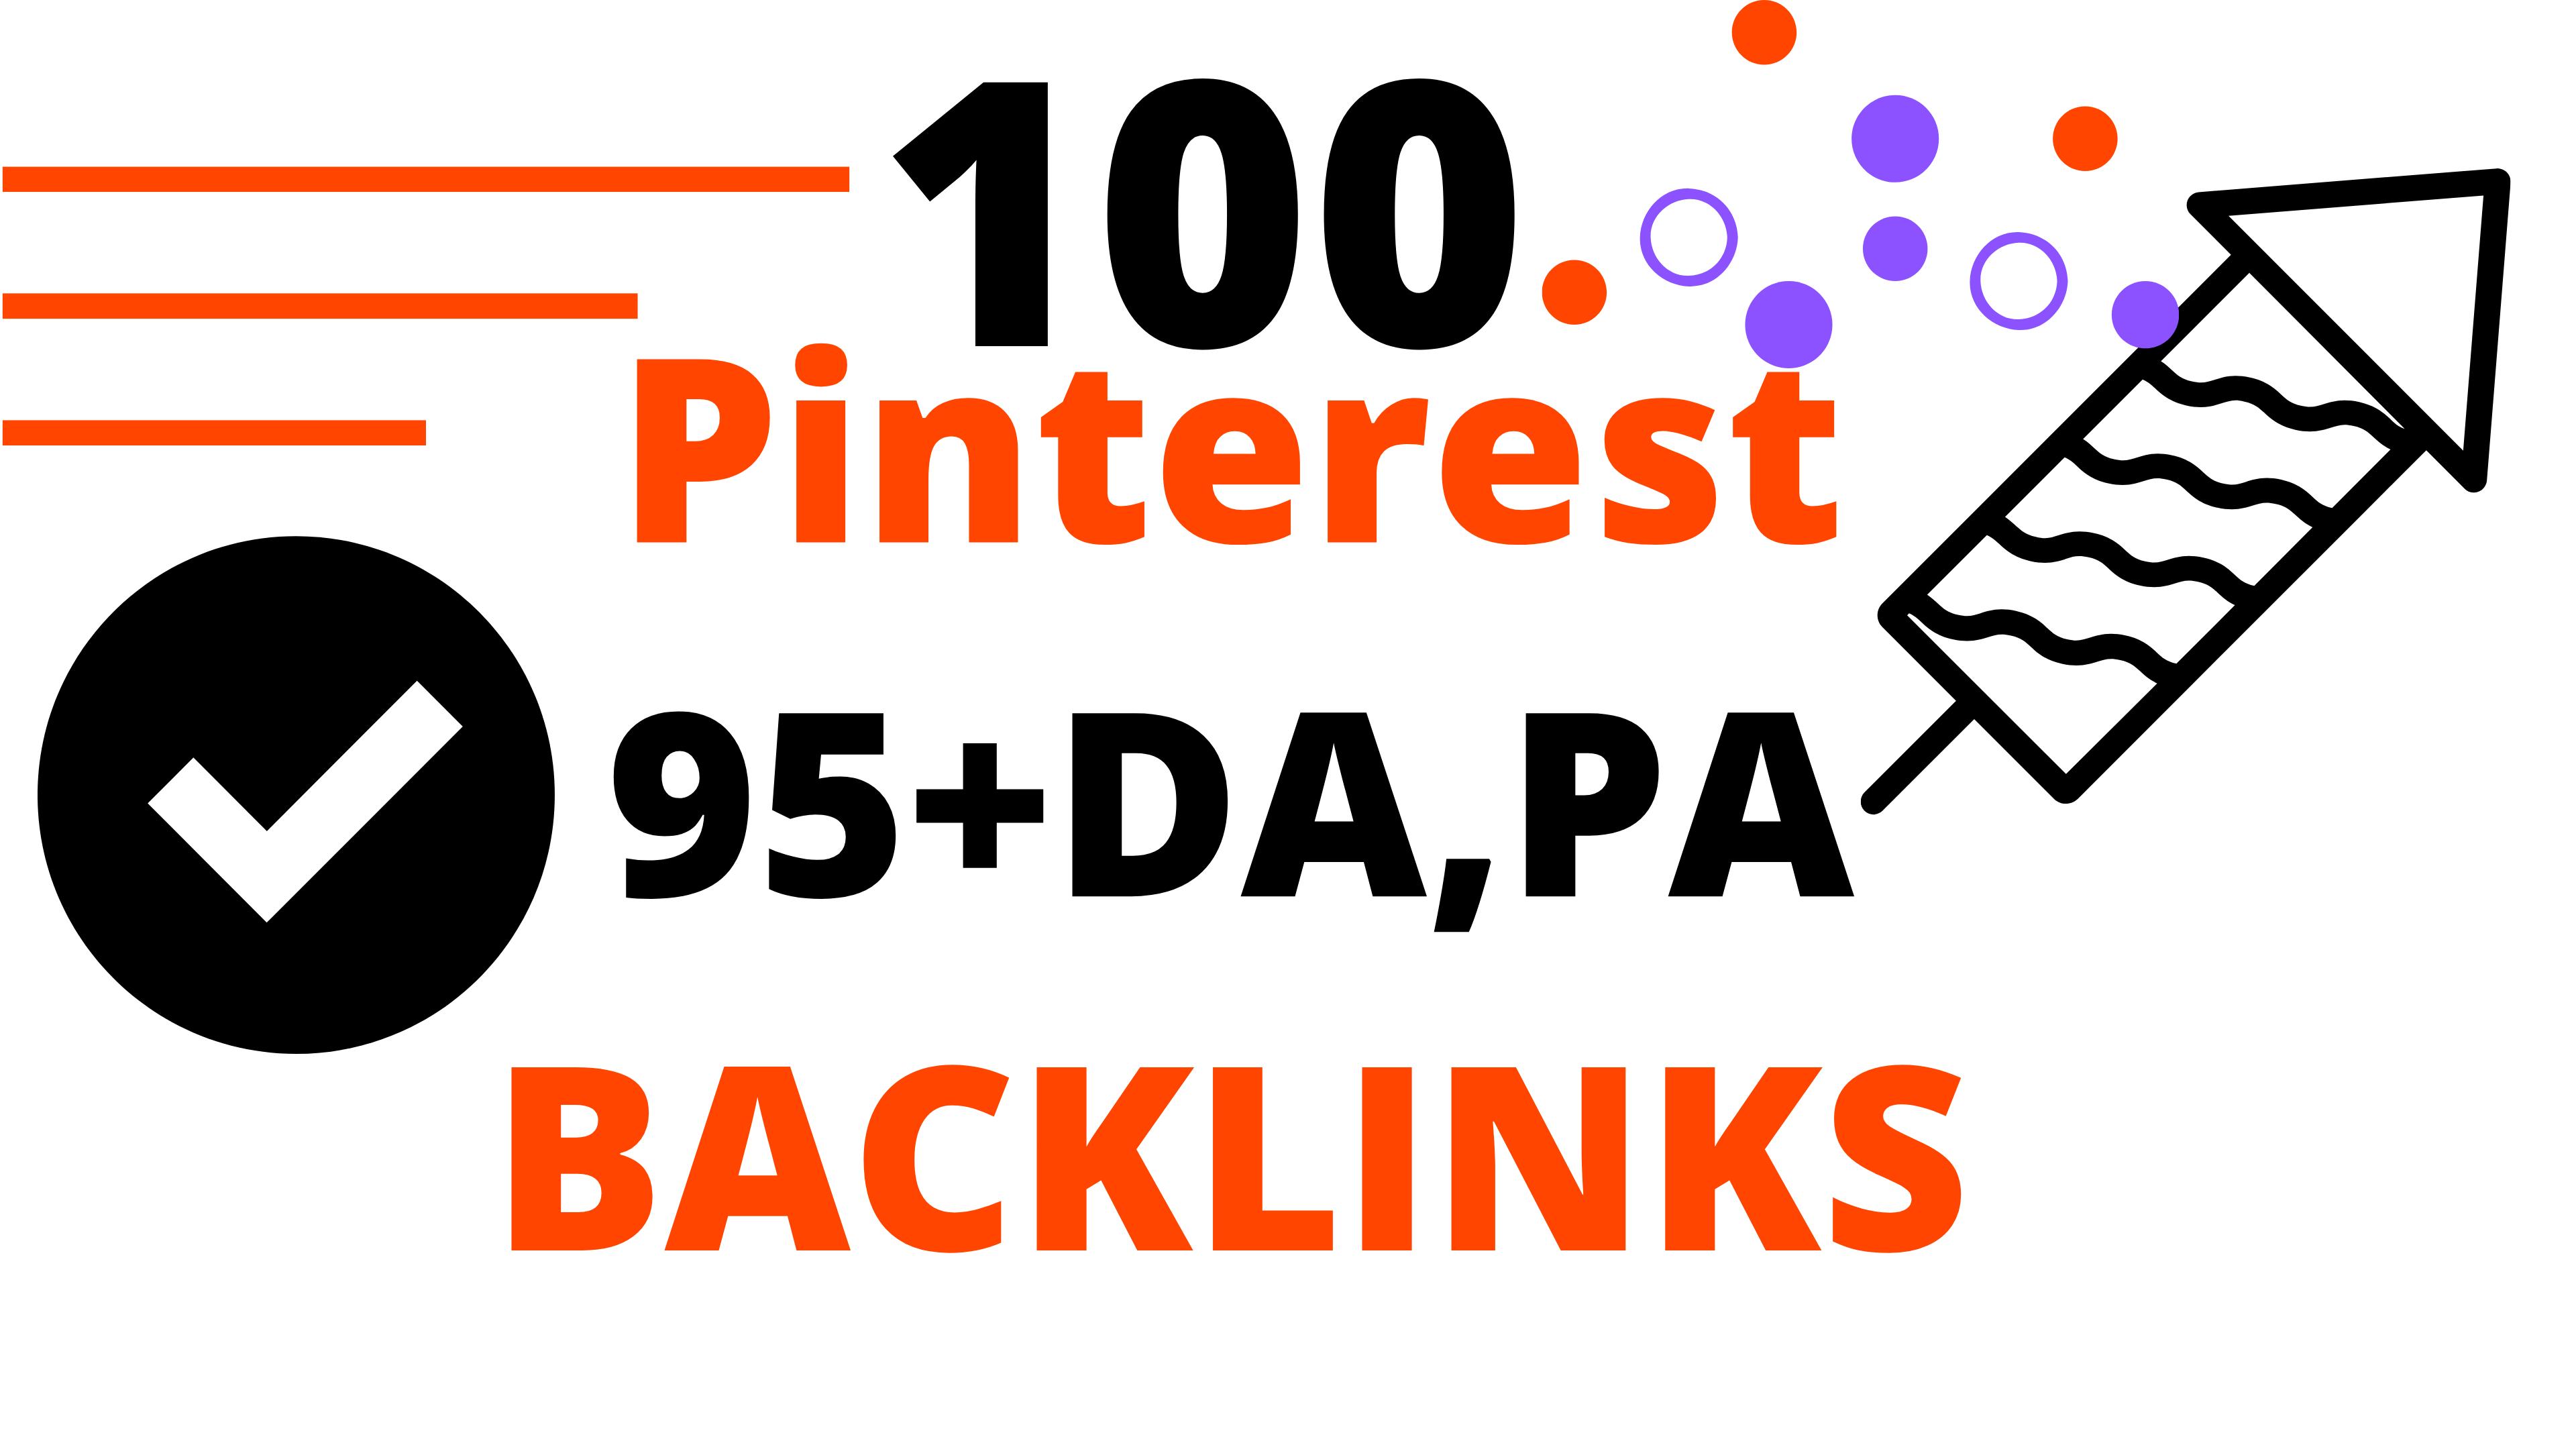 Powerful Pinterest 100 Backlinks 95+ DA,  PA High Quality Backlinks